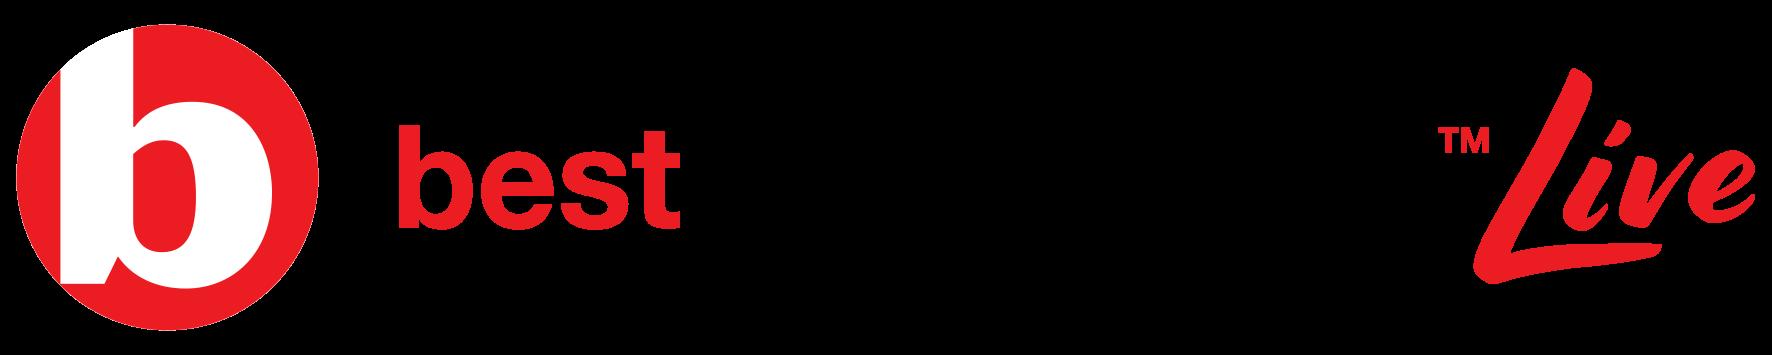 Best Companies Live logo